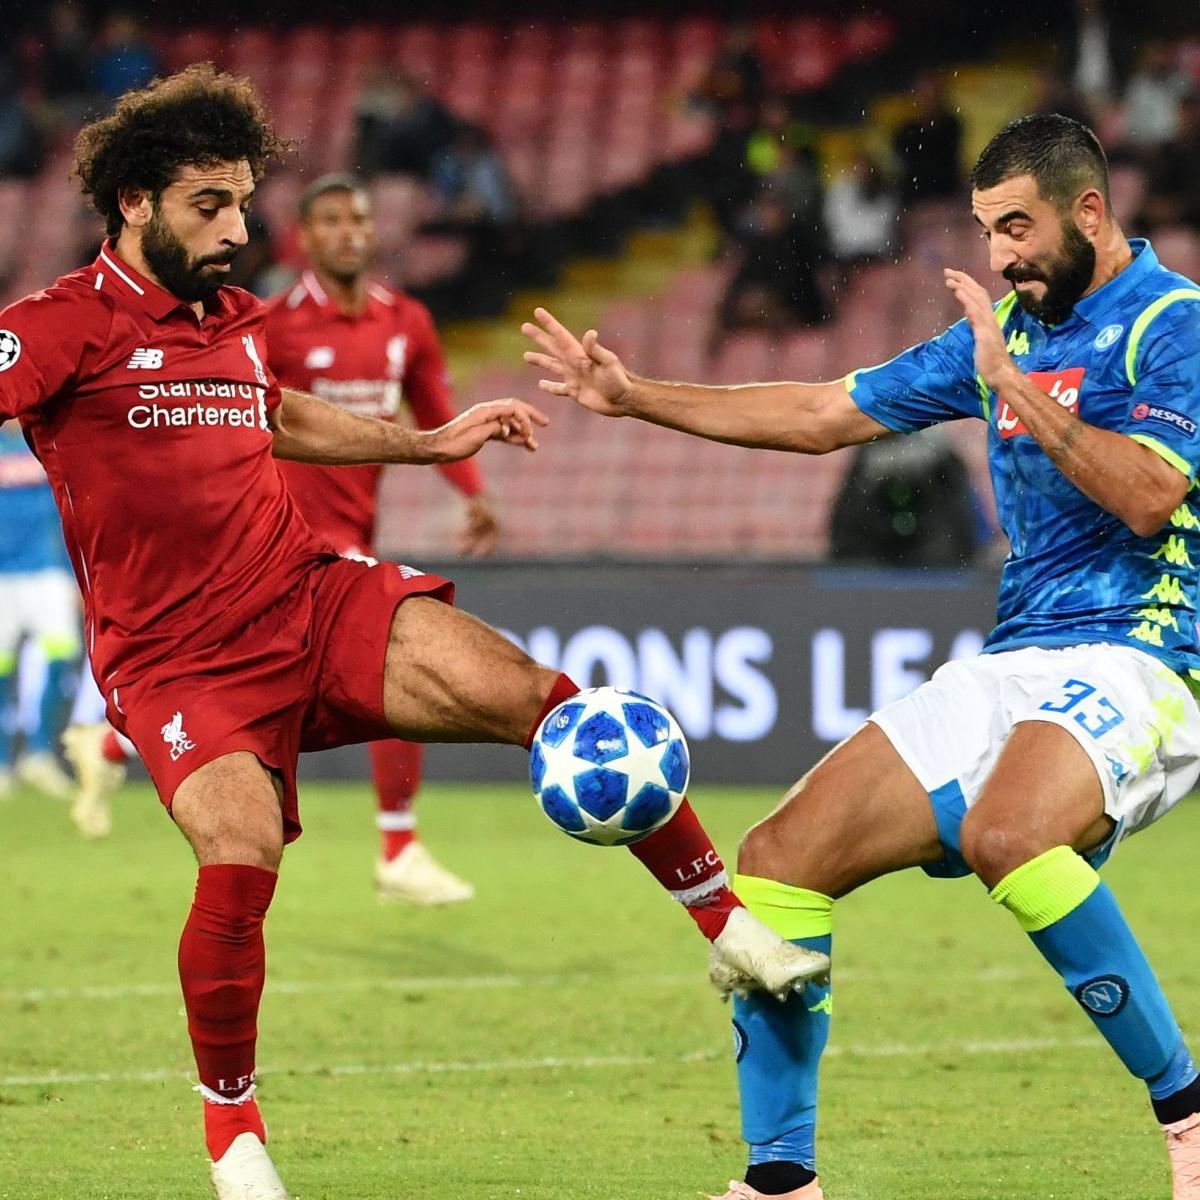 Live Streaming Soccer News Liverpool Vs Benfica Live: Liverpool Vs. Napoli: Live Stream Info, Odds, Group